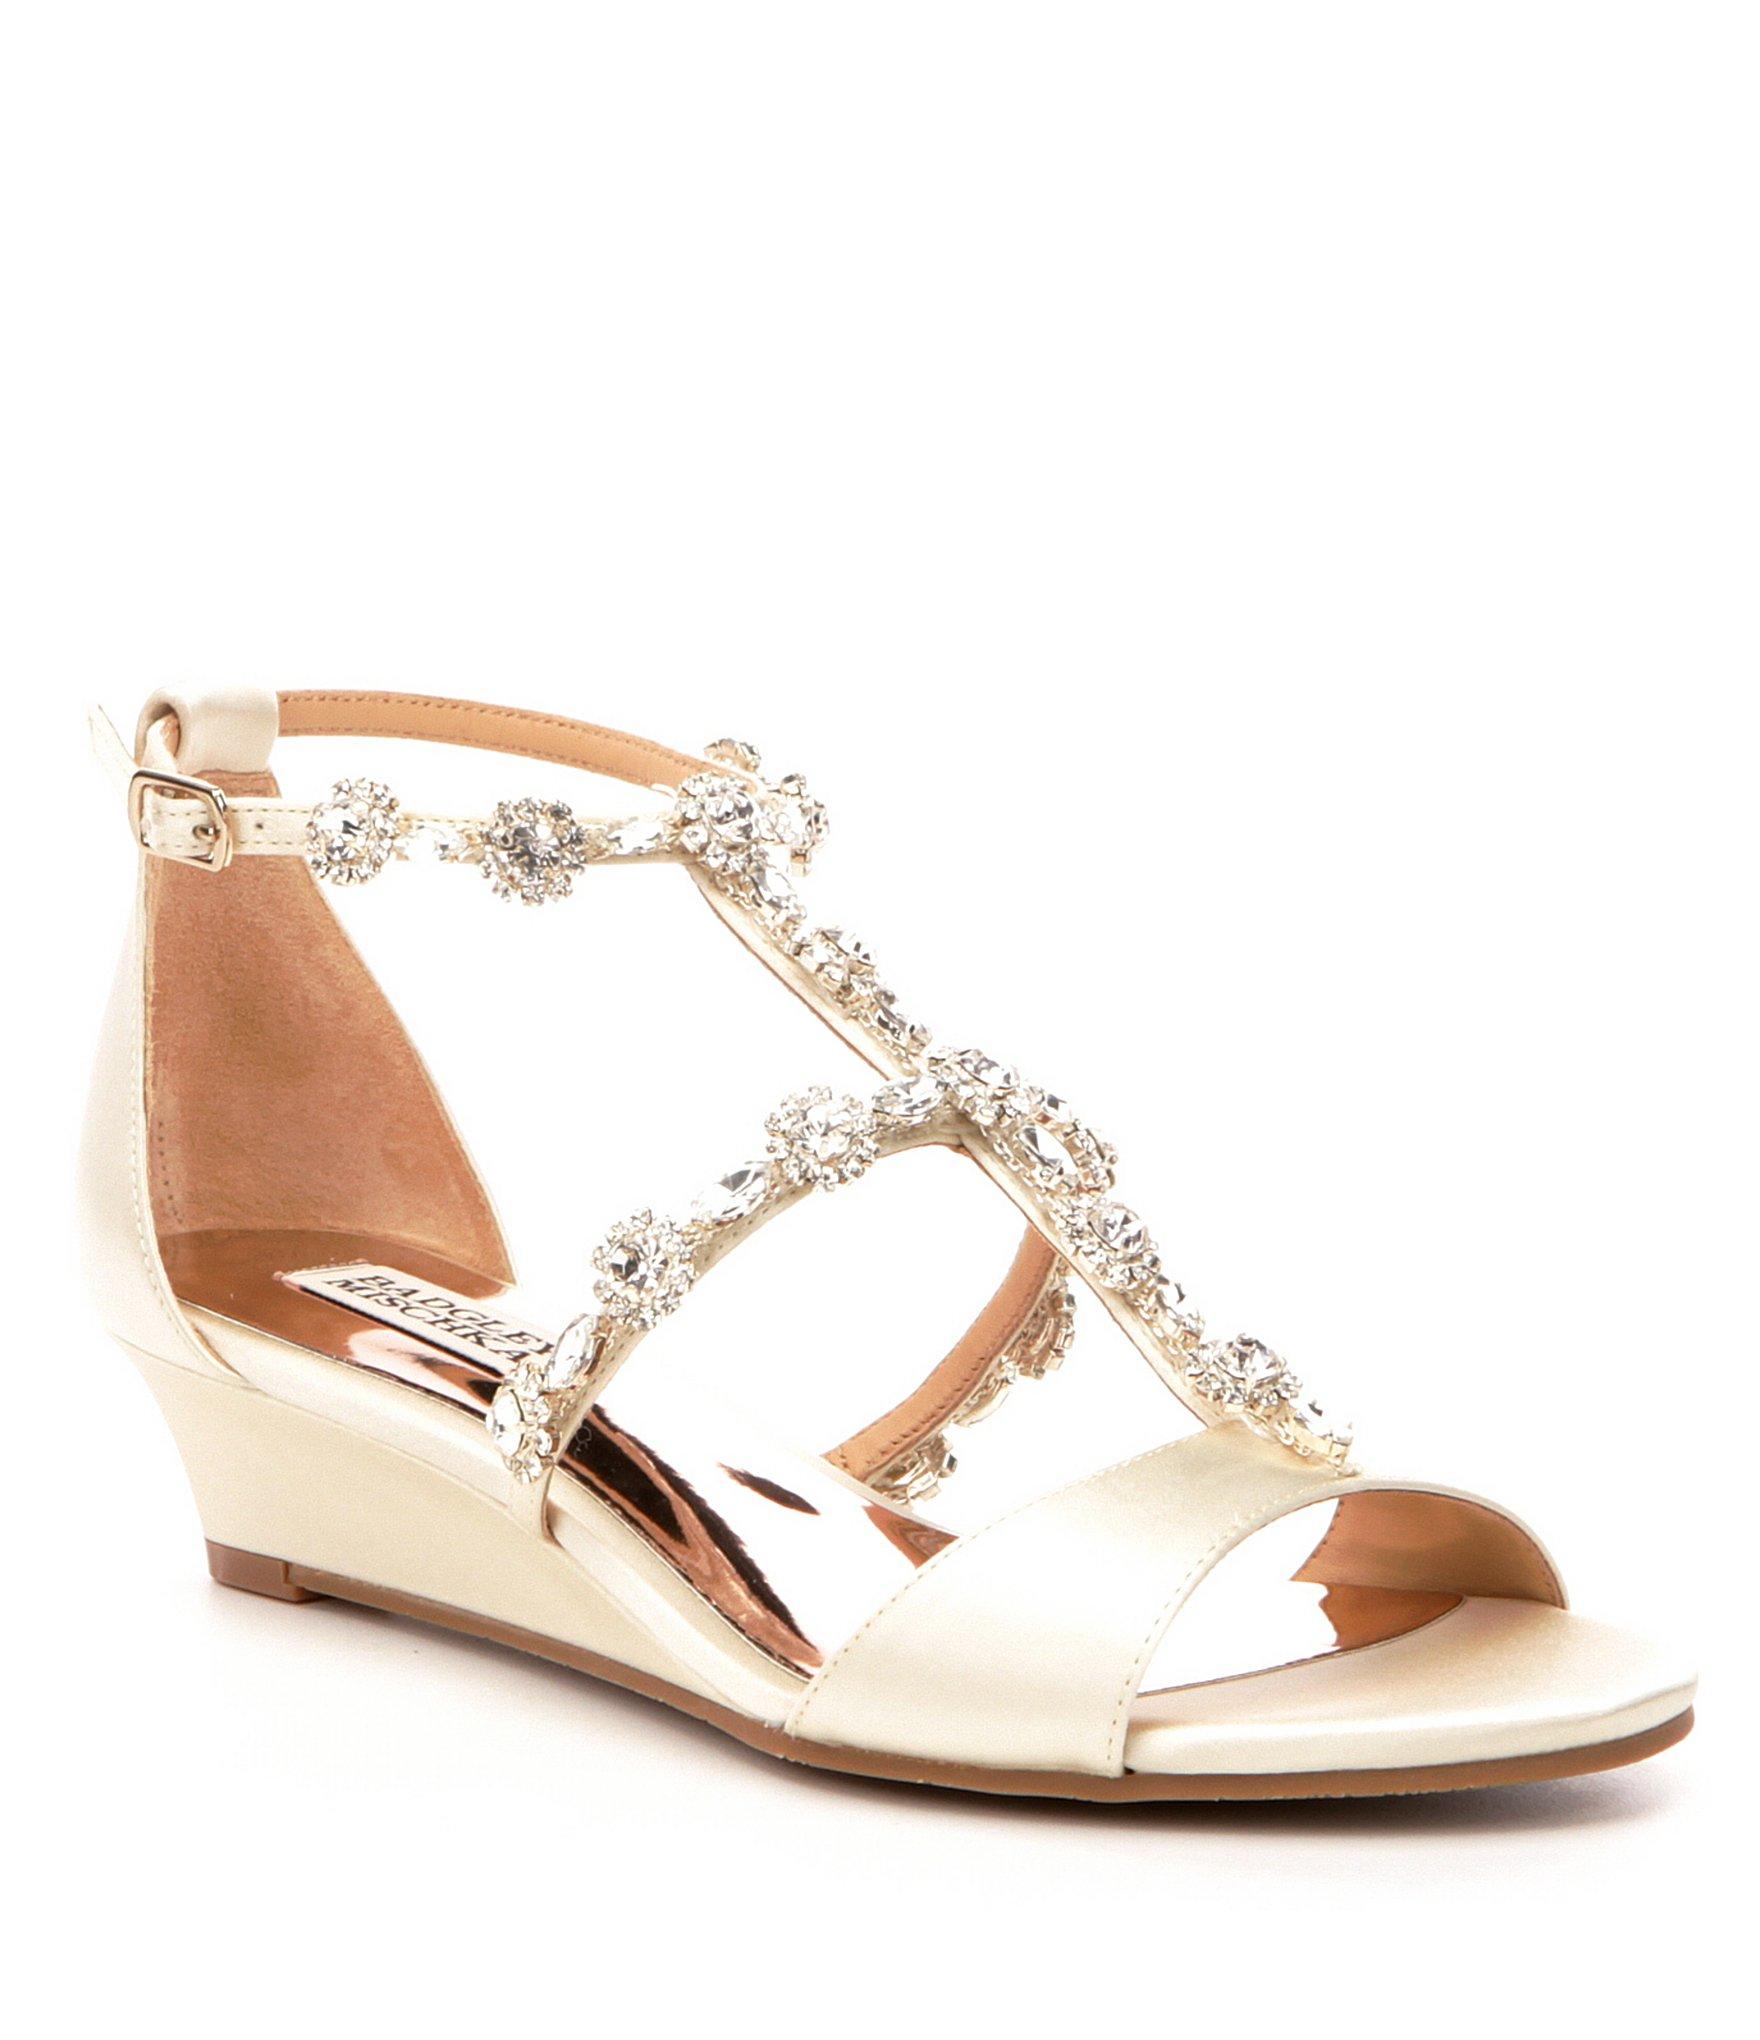 Badgley Mischka Shoes Sale